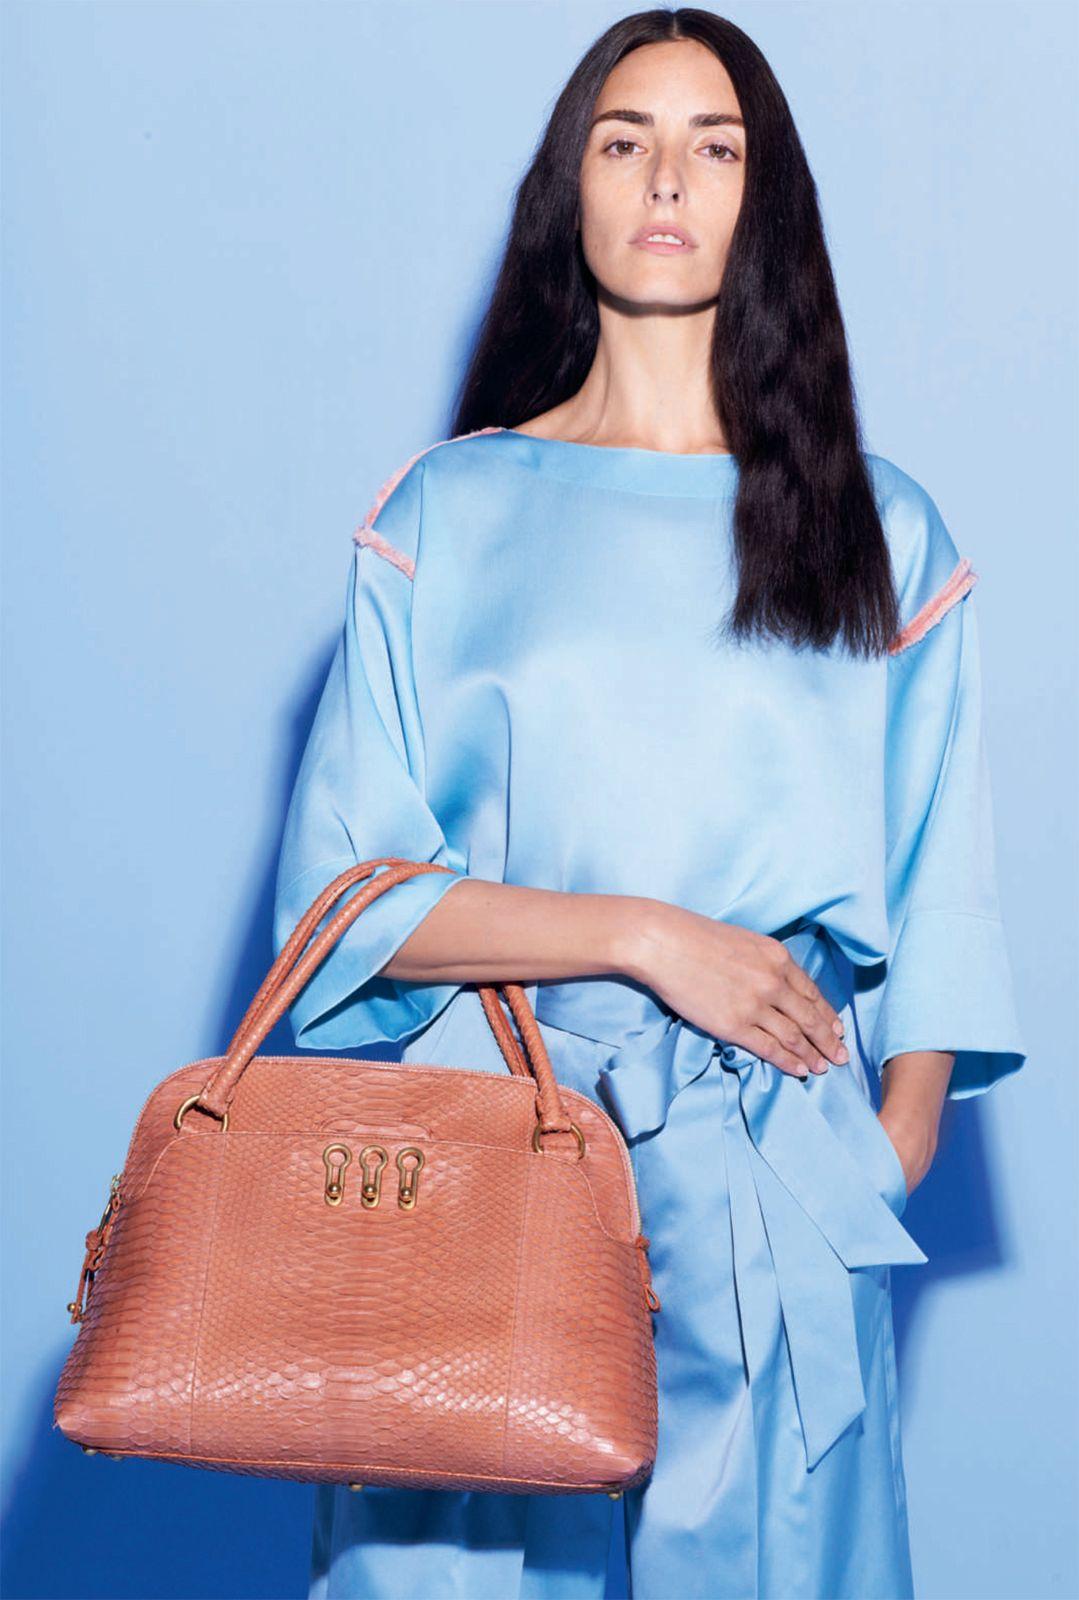 Modele lookbook – Broderies Sonia Rykiel – Bande organza effrange multicolore – Printemps ete 2013